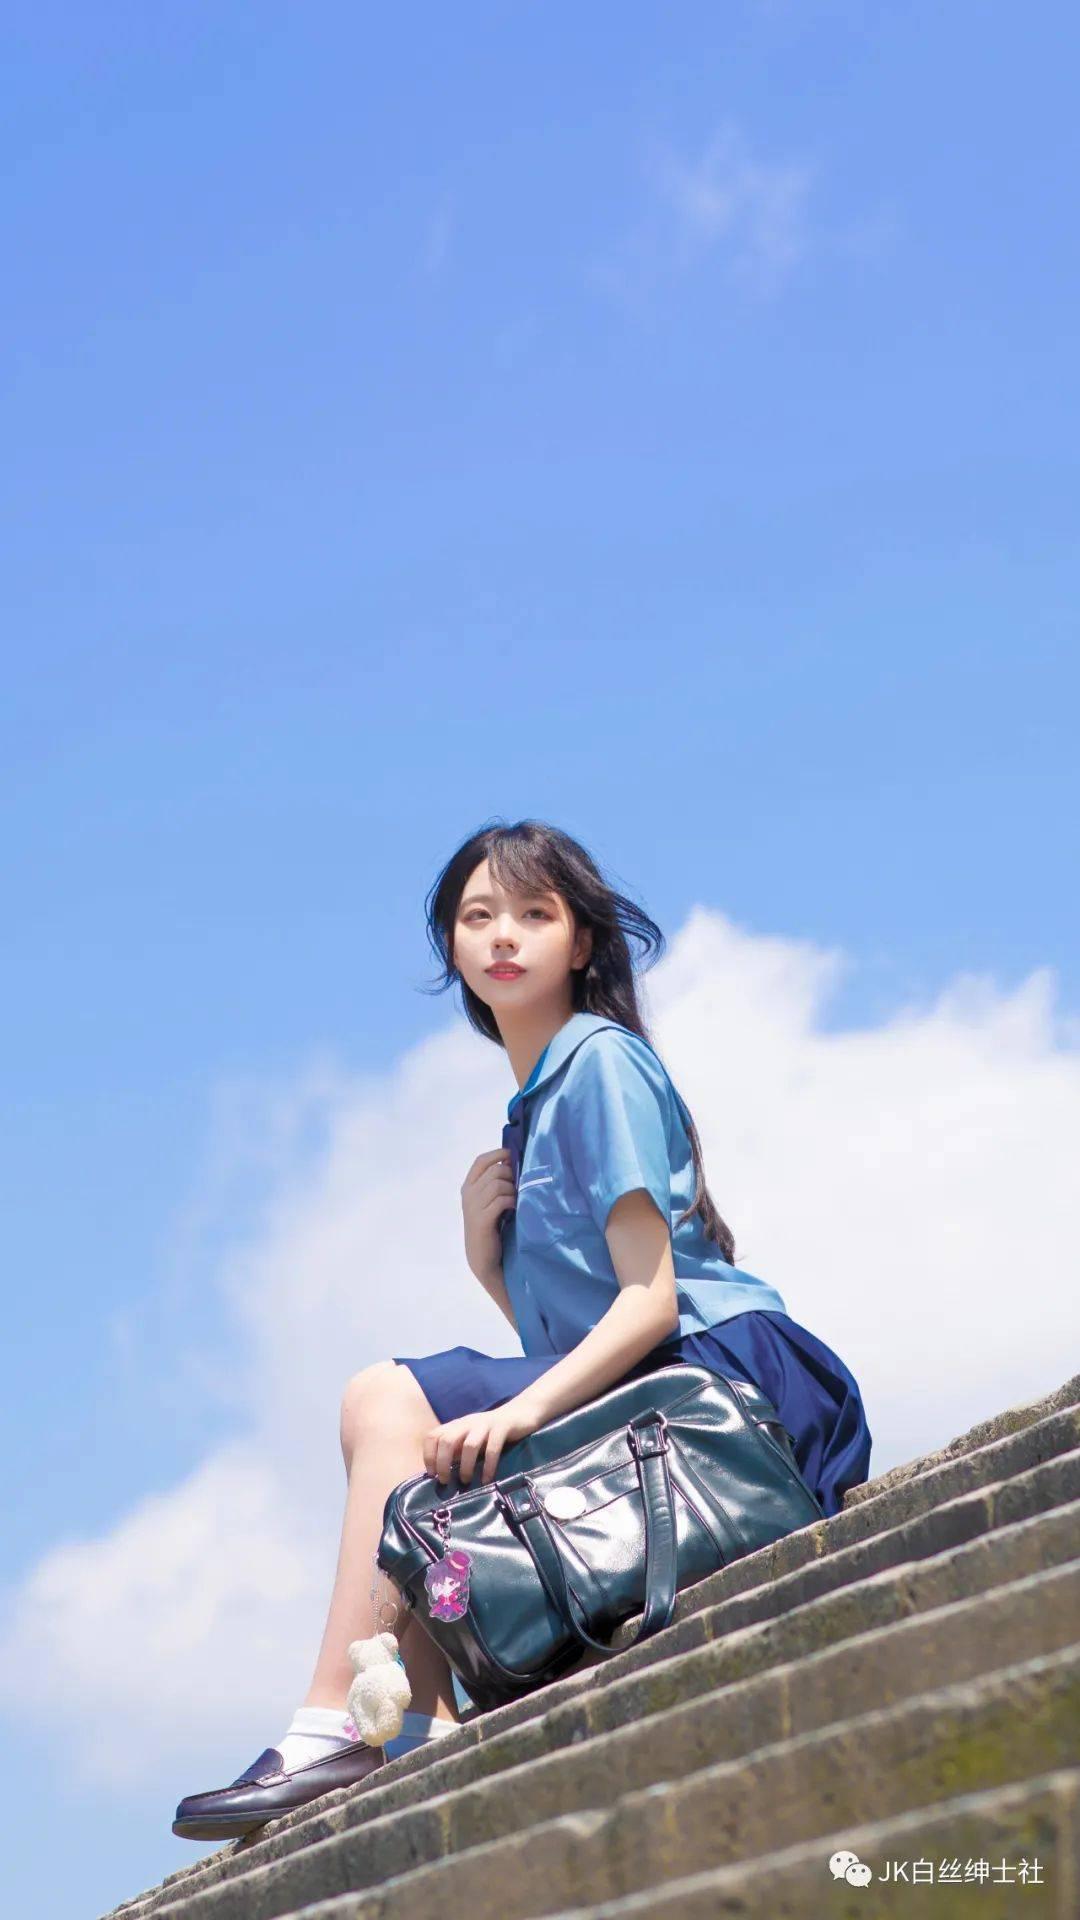 JK少女:码头阳光,还有回眸的她